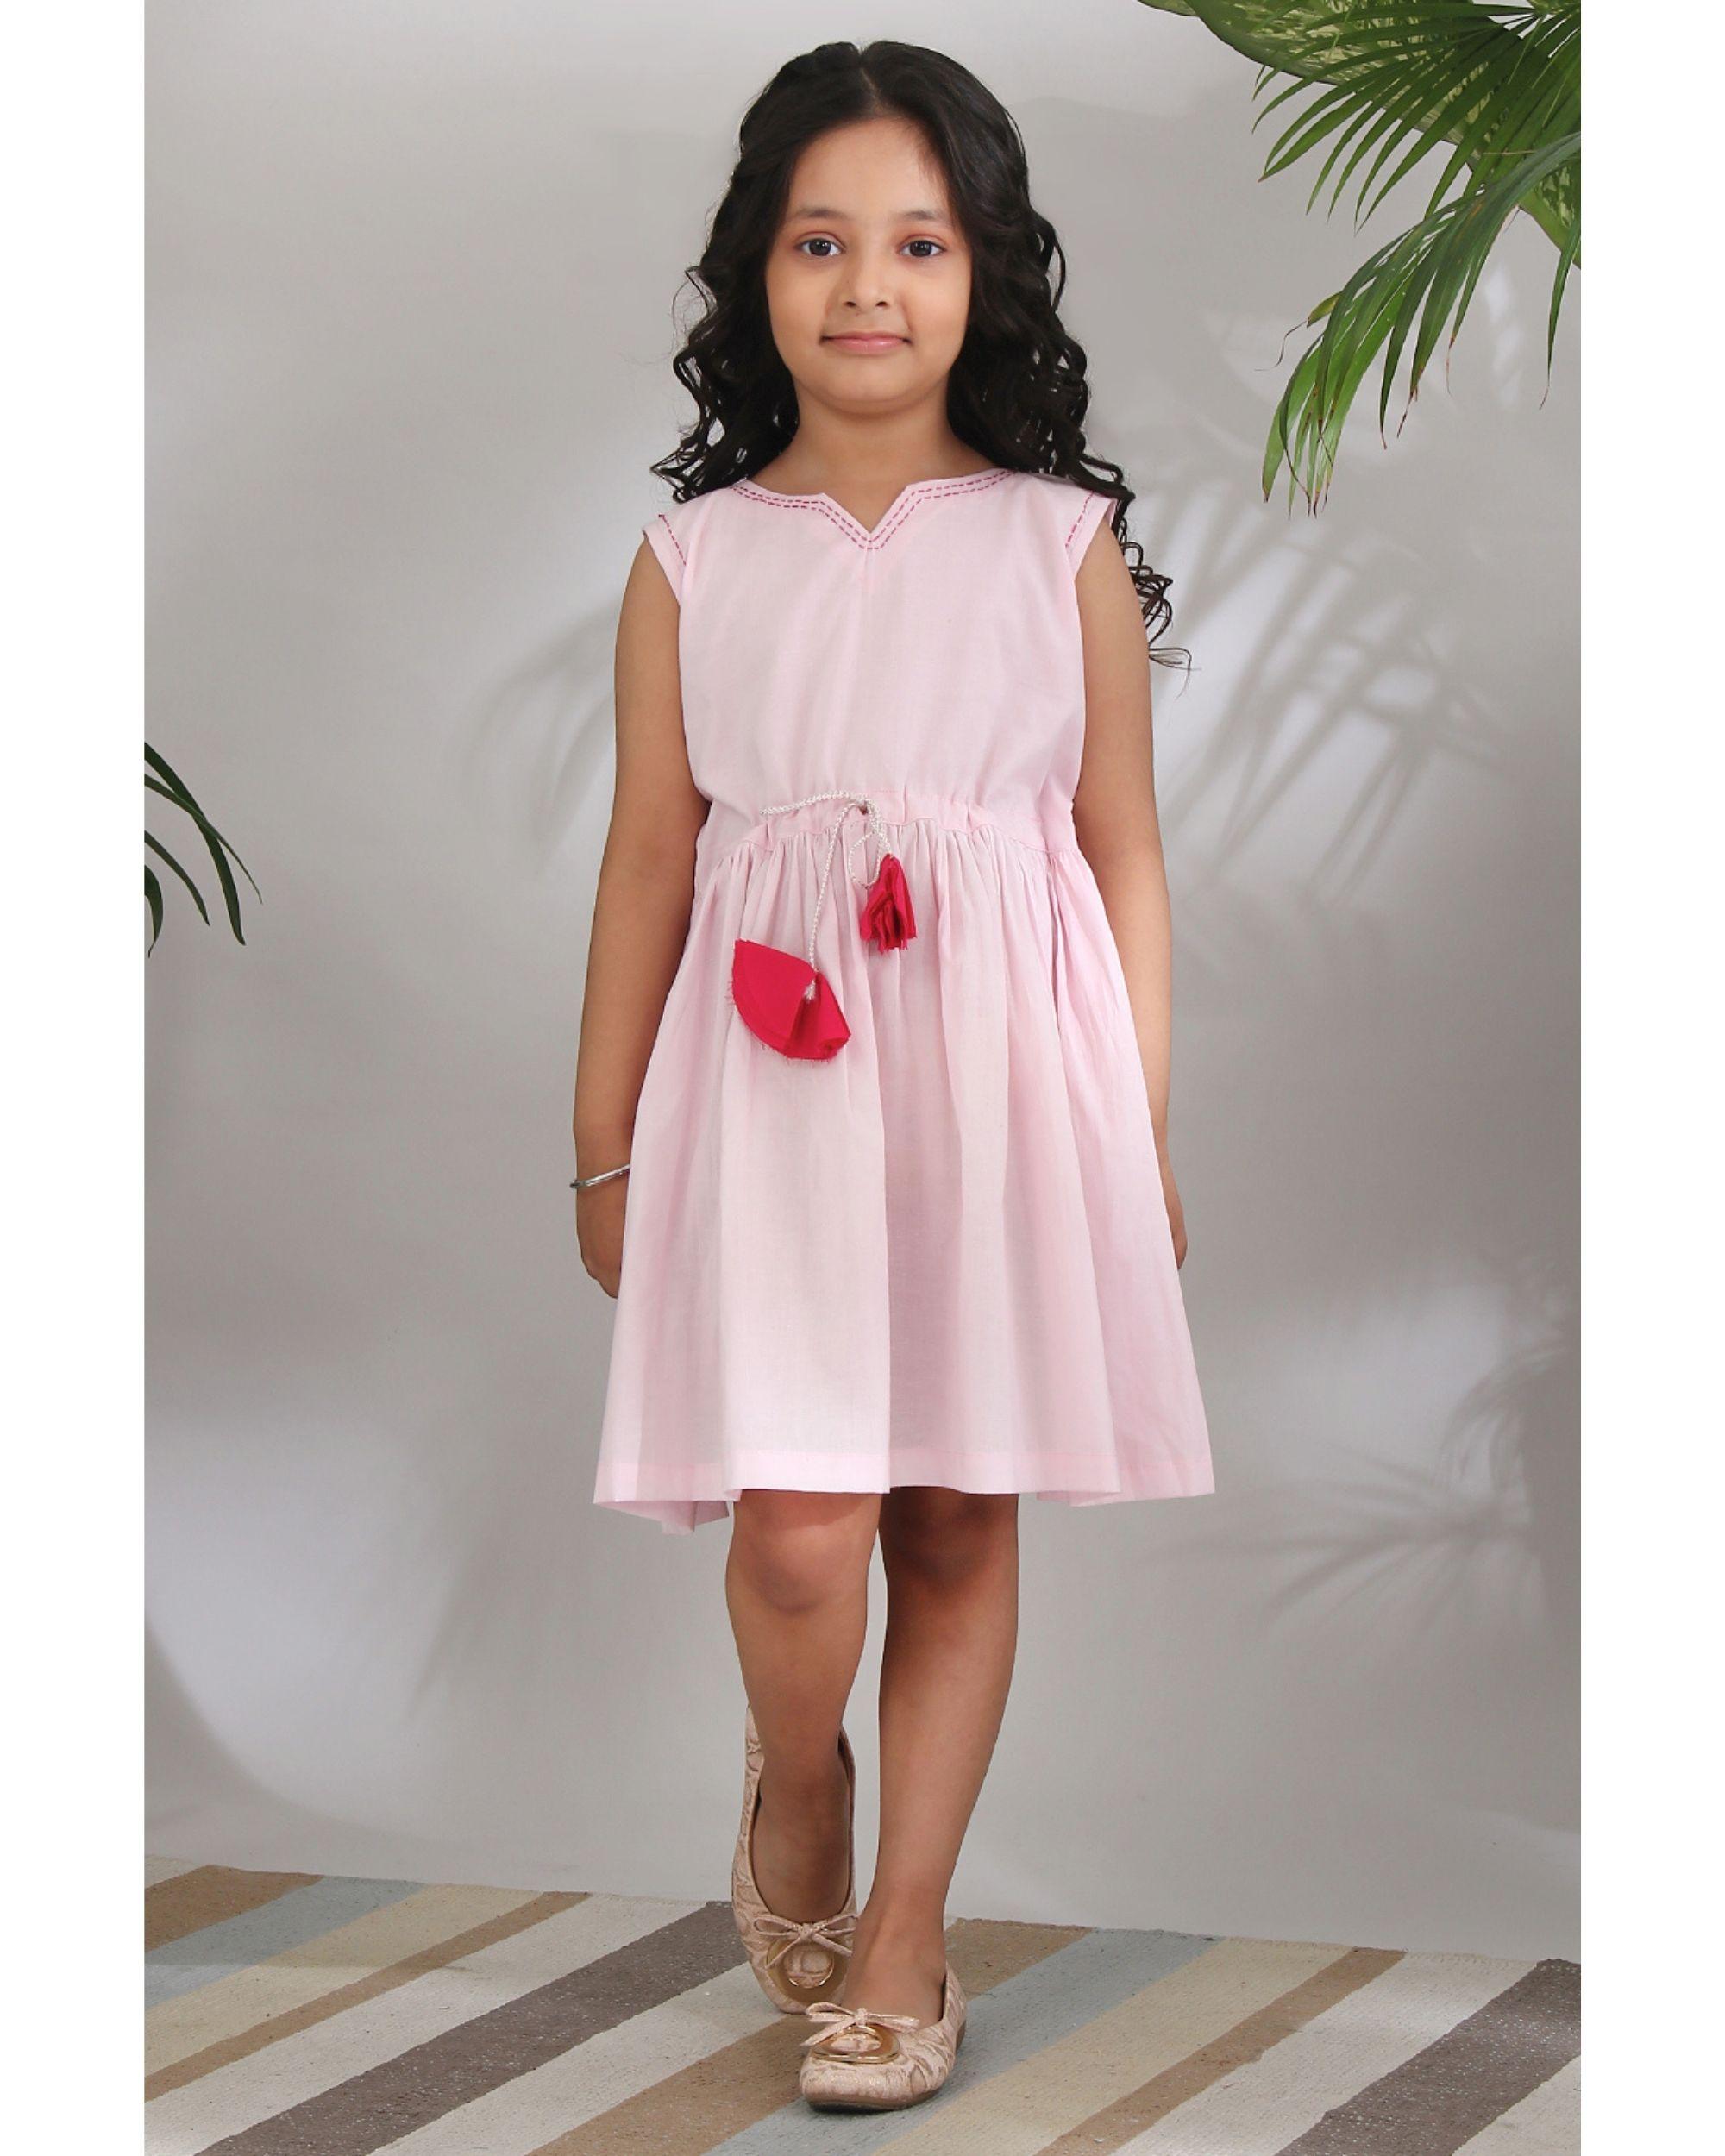 Gulab kantha dress